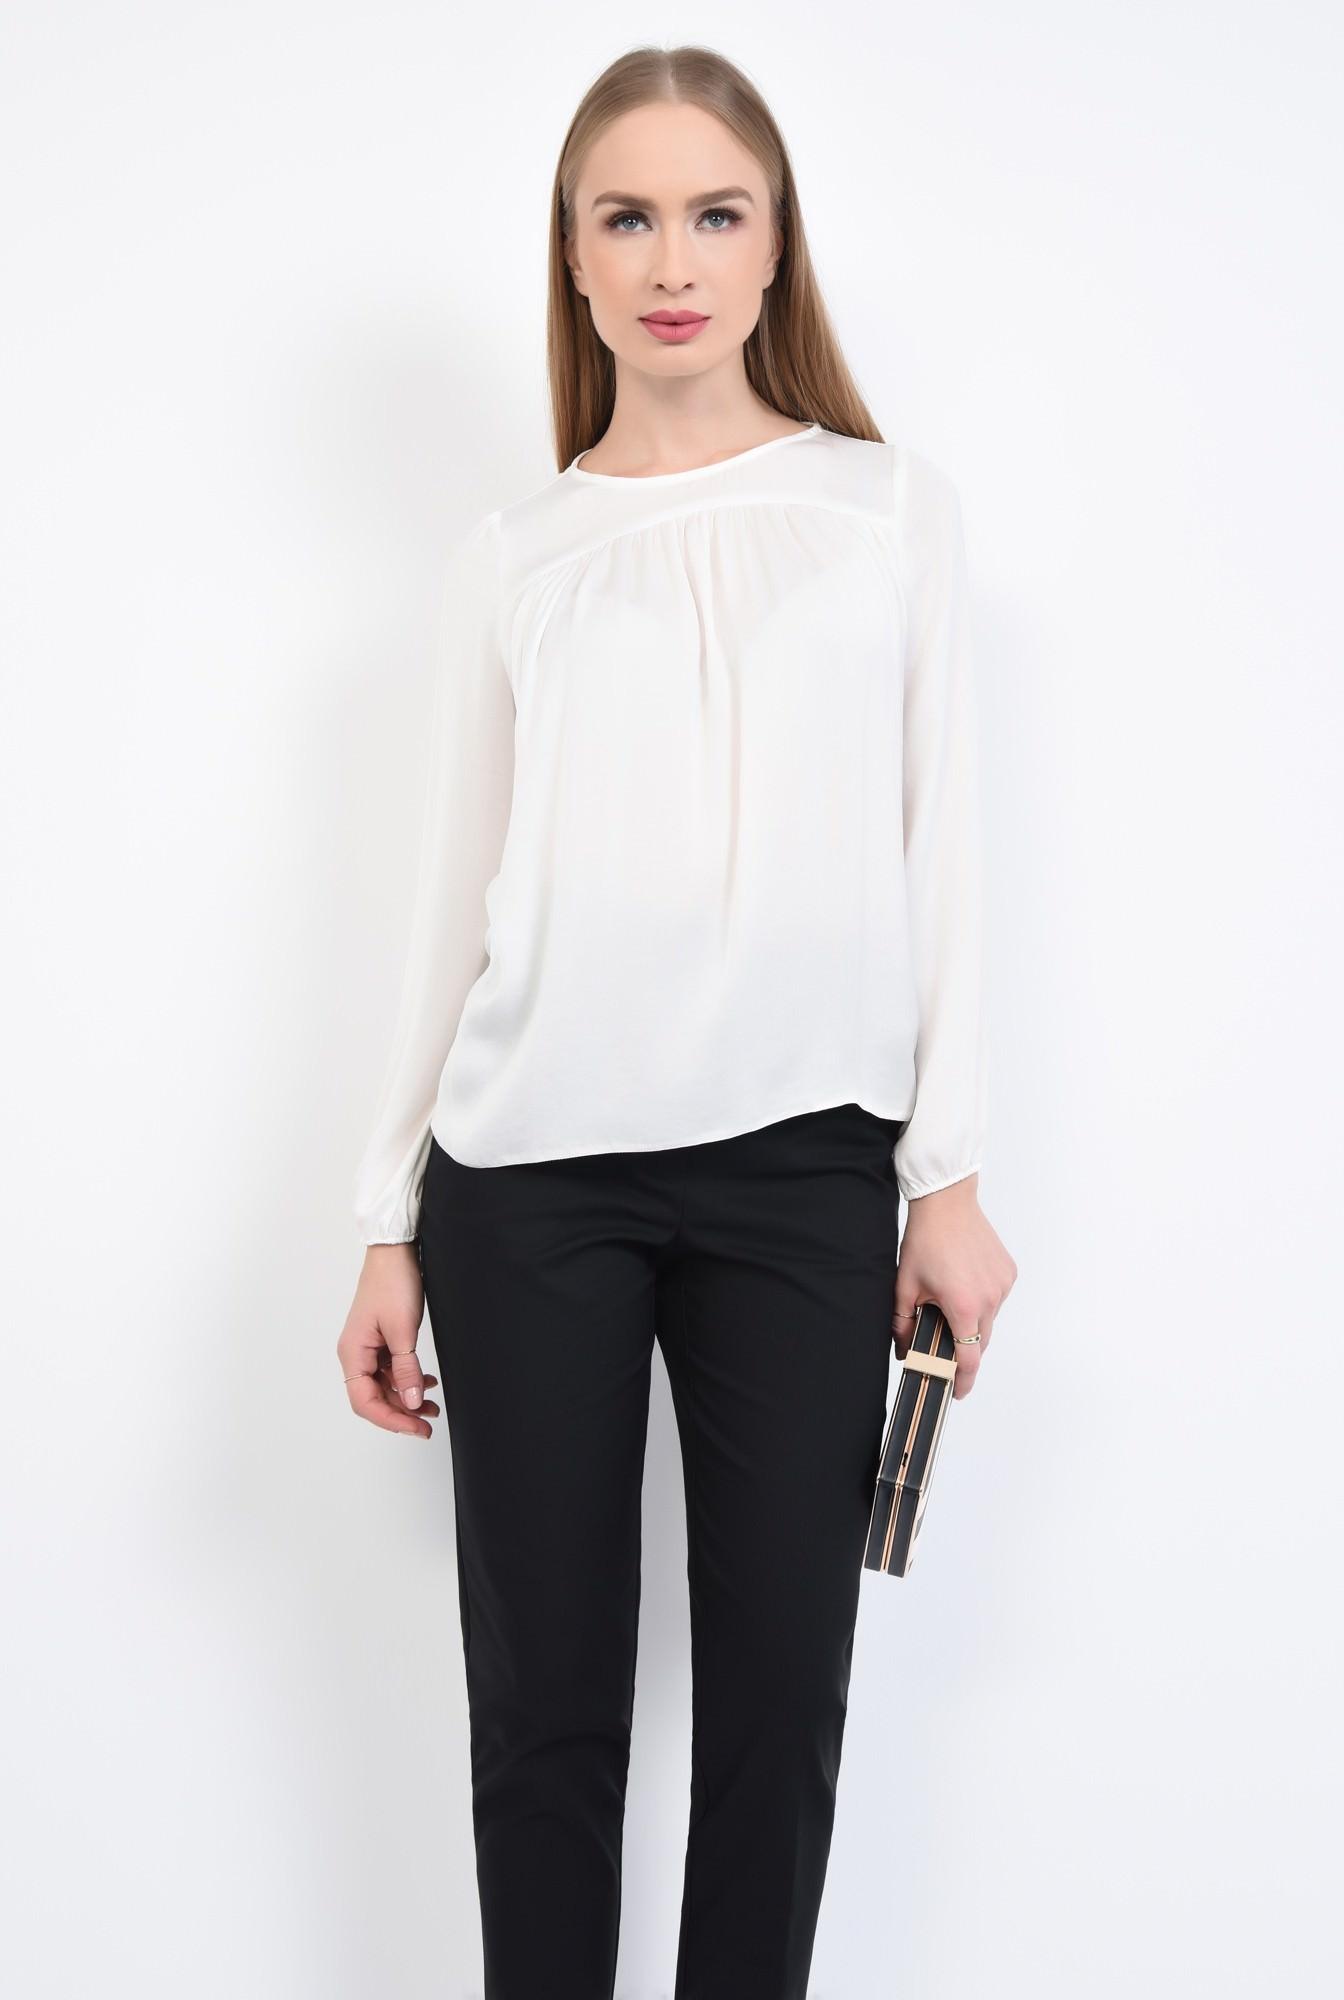 0 - Bluza eleganta, vaporoasa, decolteu rotund